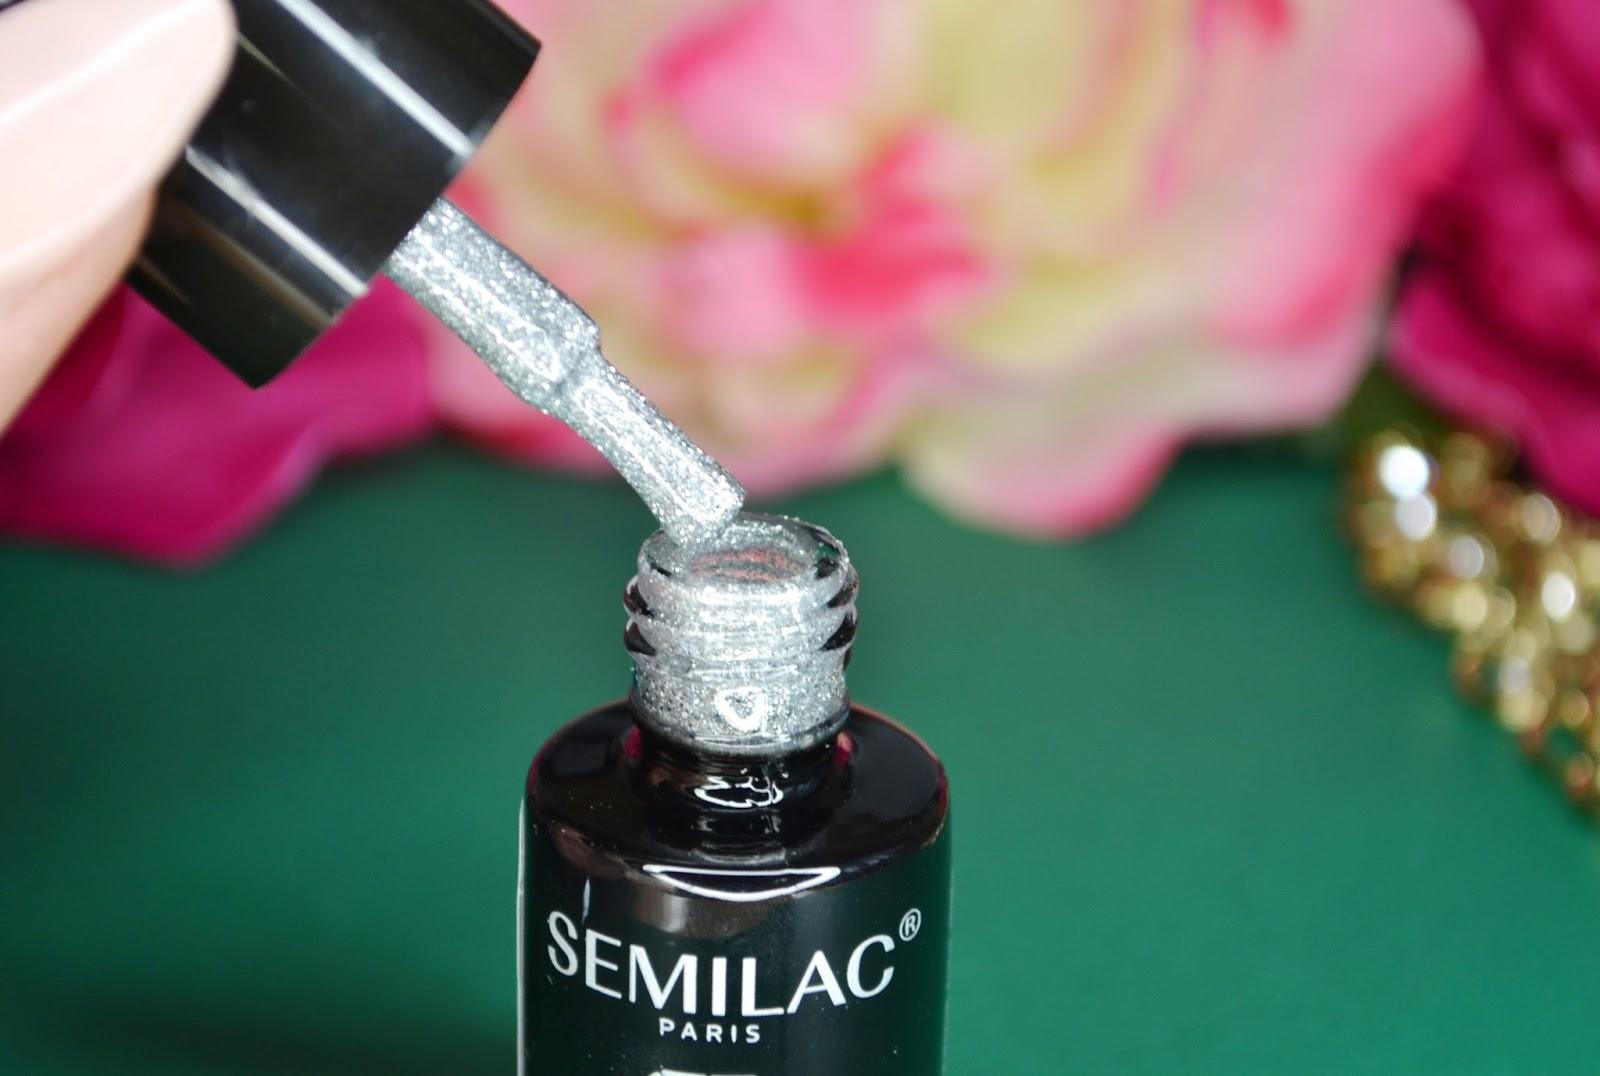 lakiery hybrydowe semilac